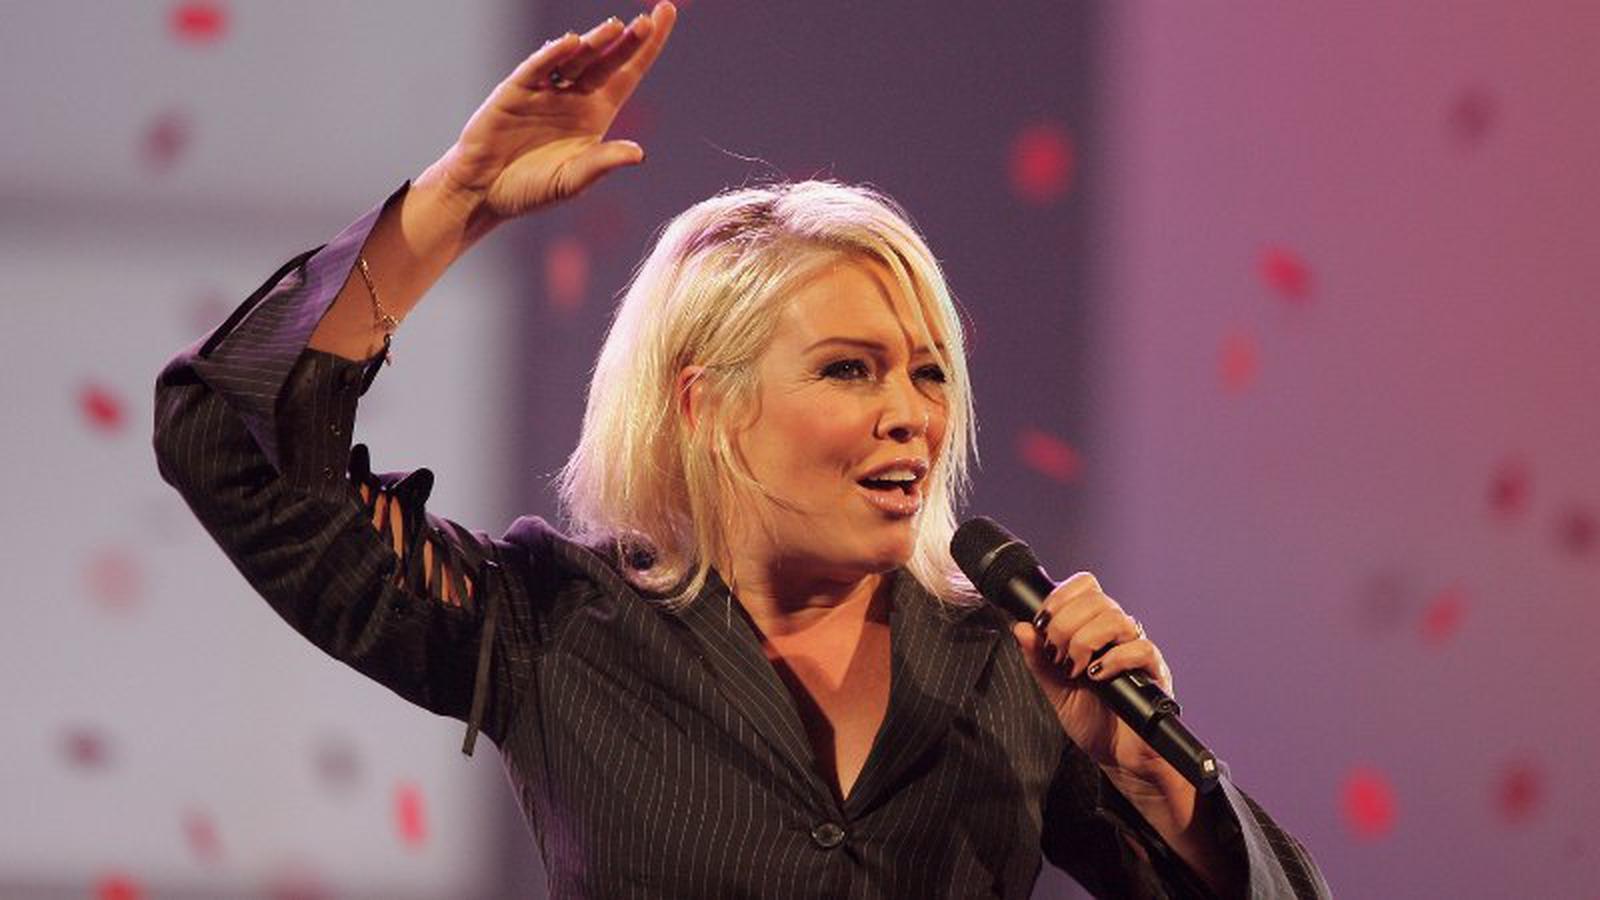 Kim Wilde sings hits on London train